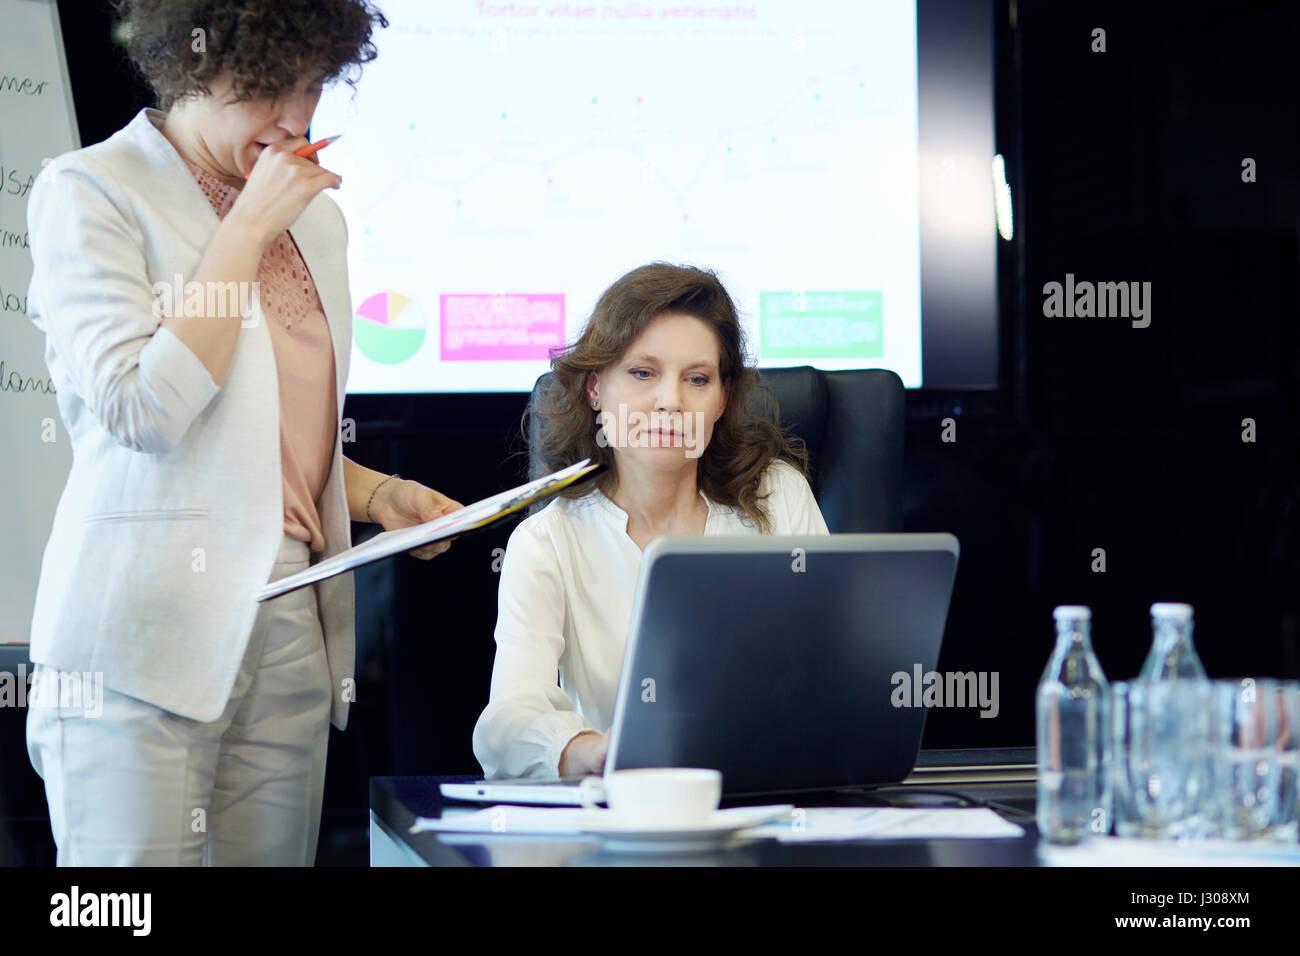 Two business women having meeting - Stock Image